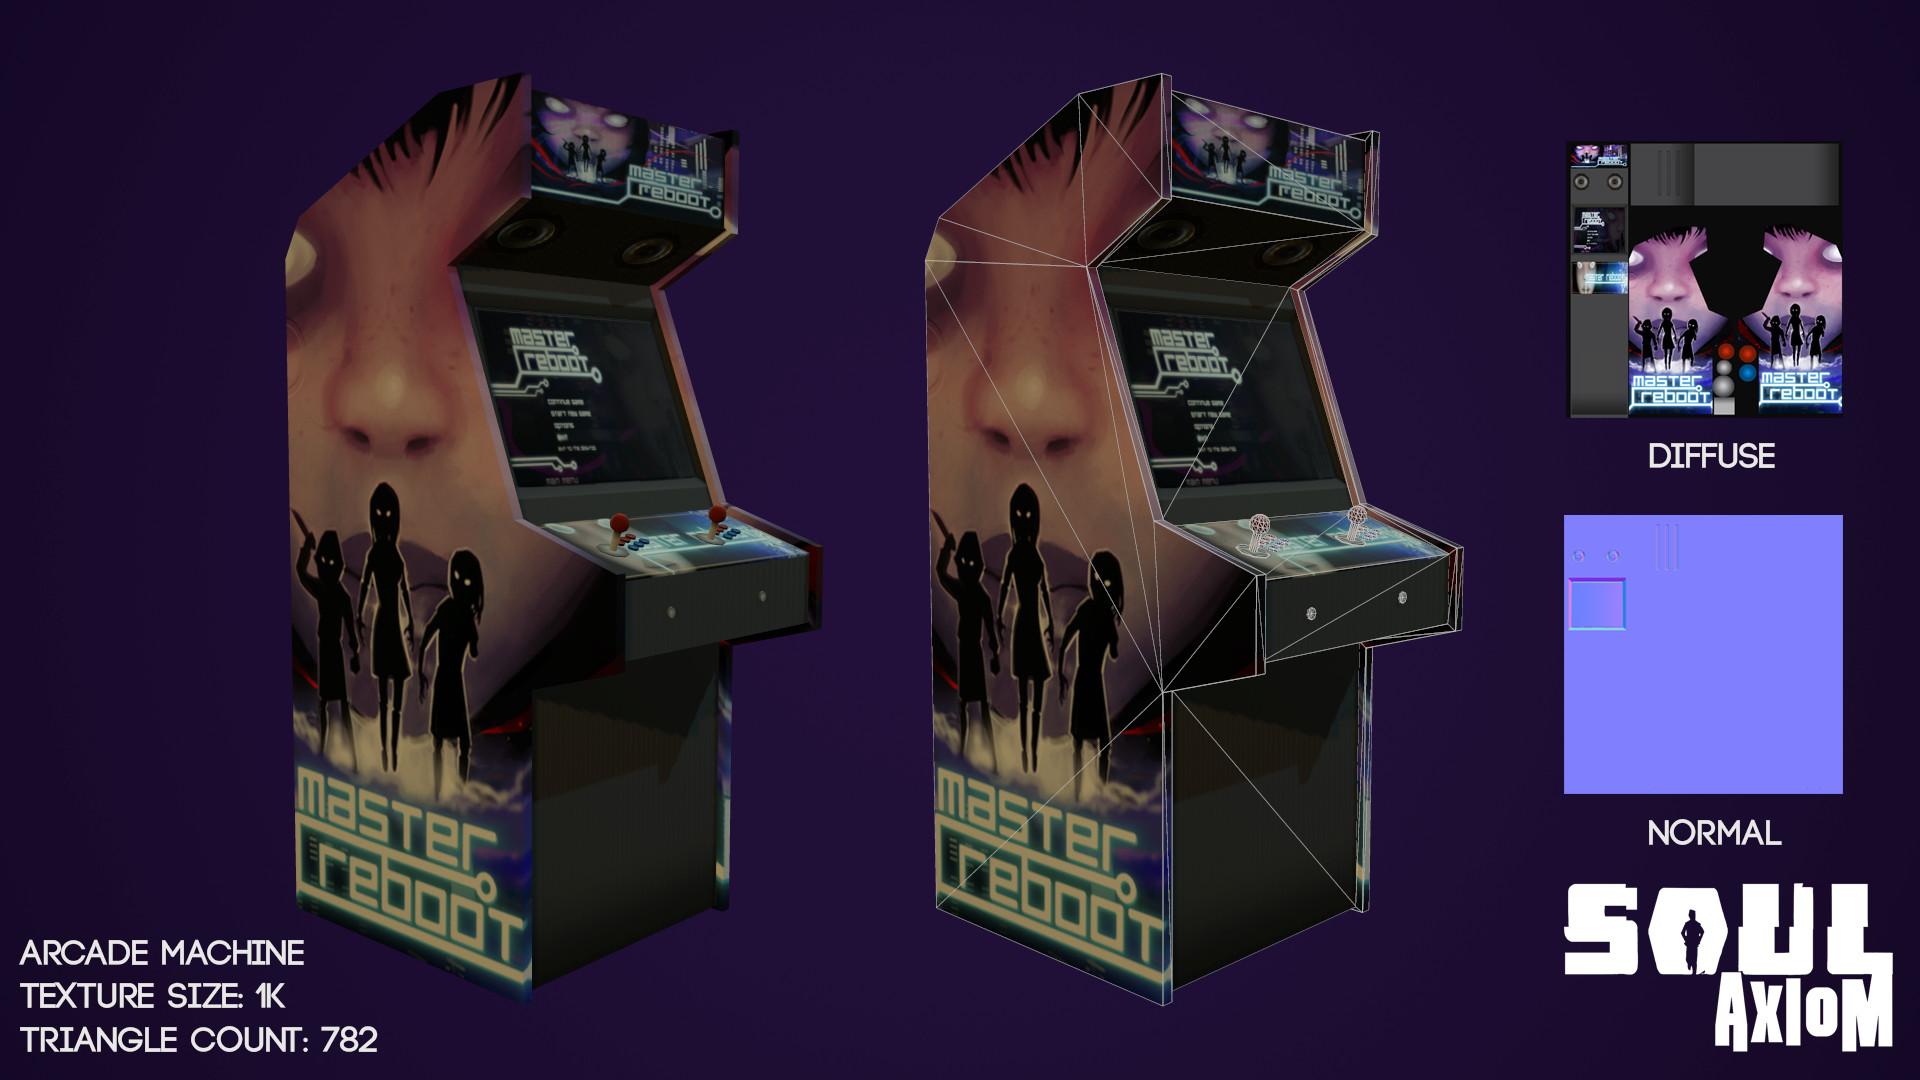 Martin giles arcade machine